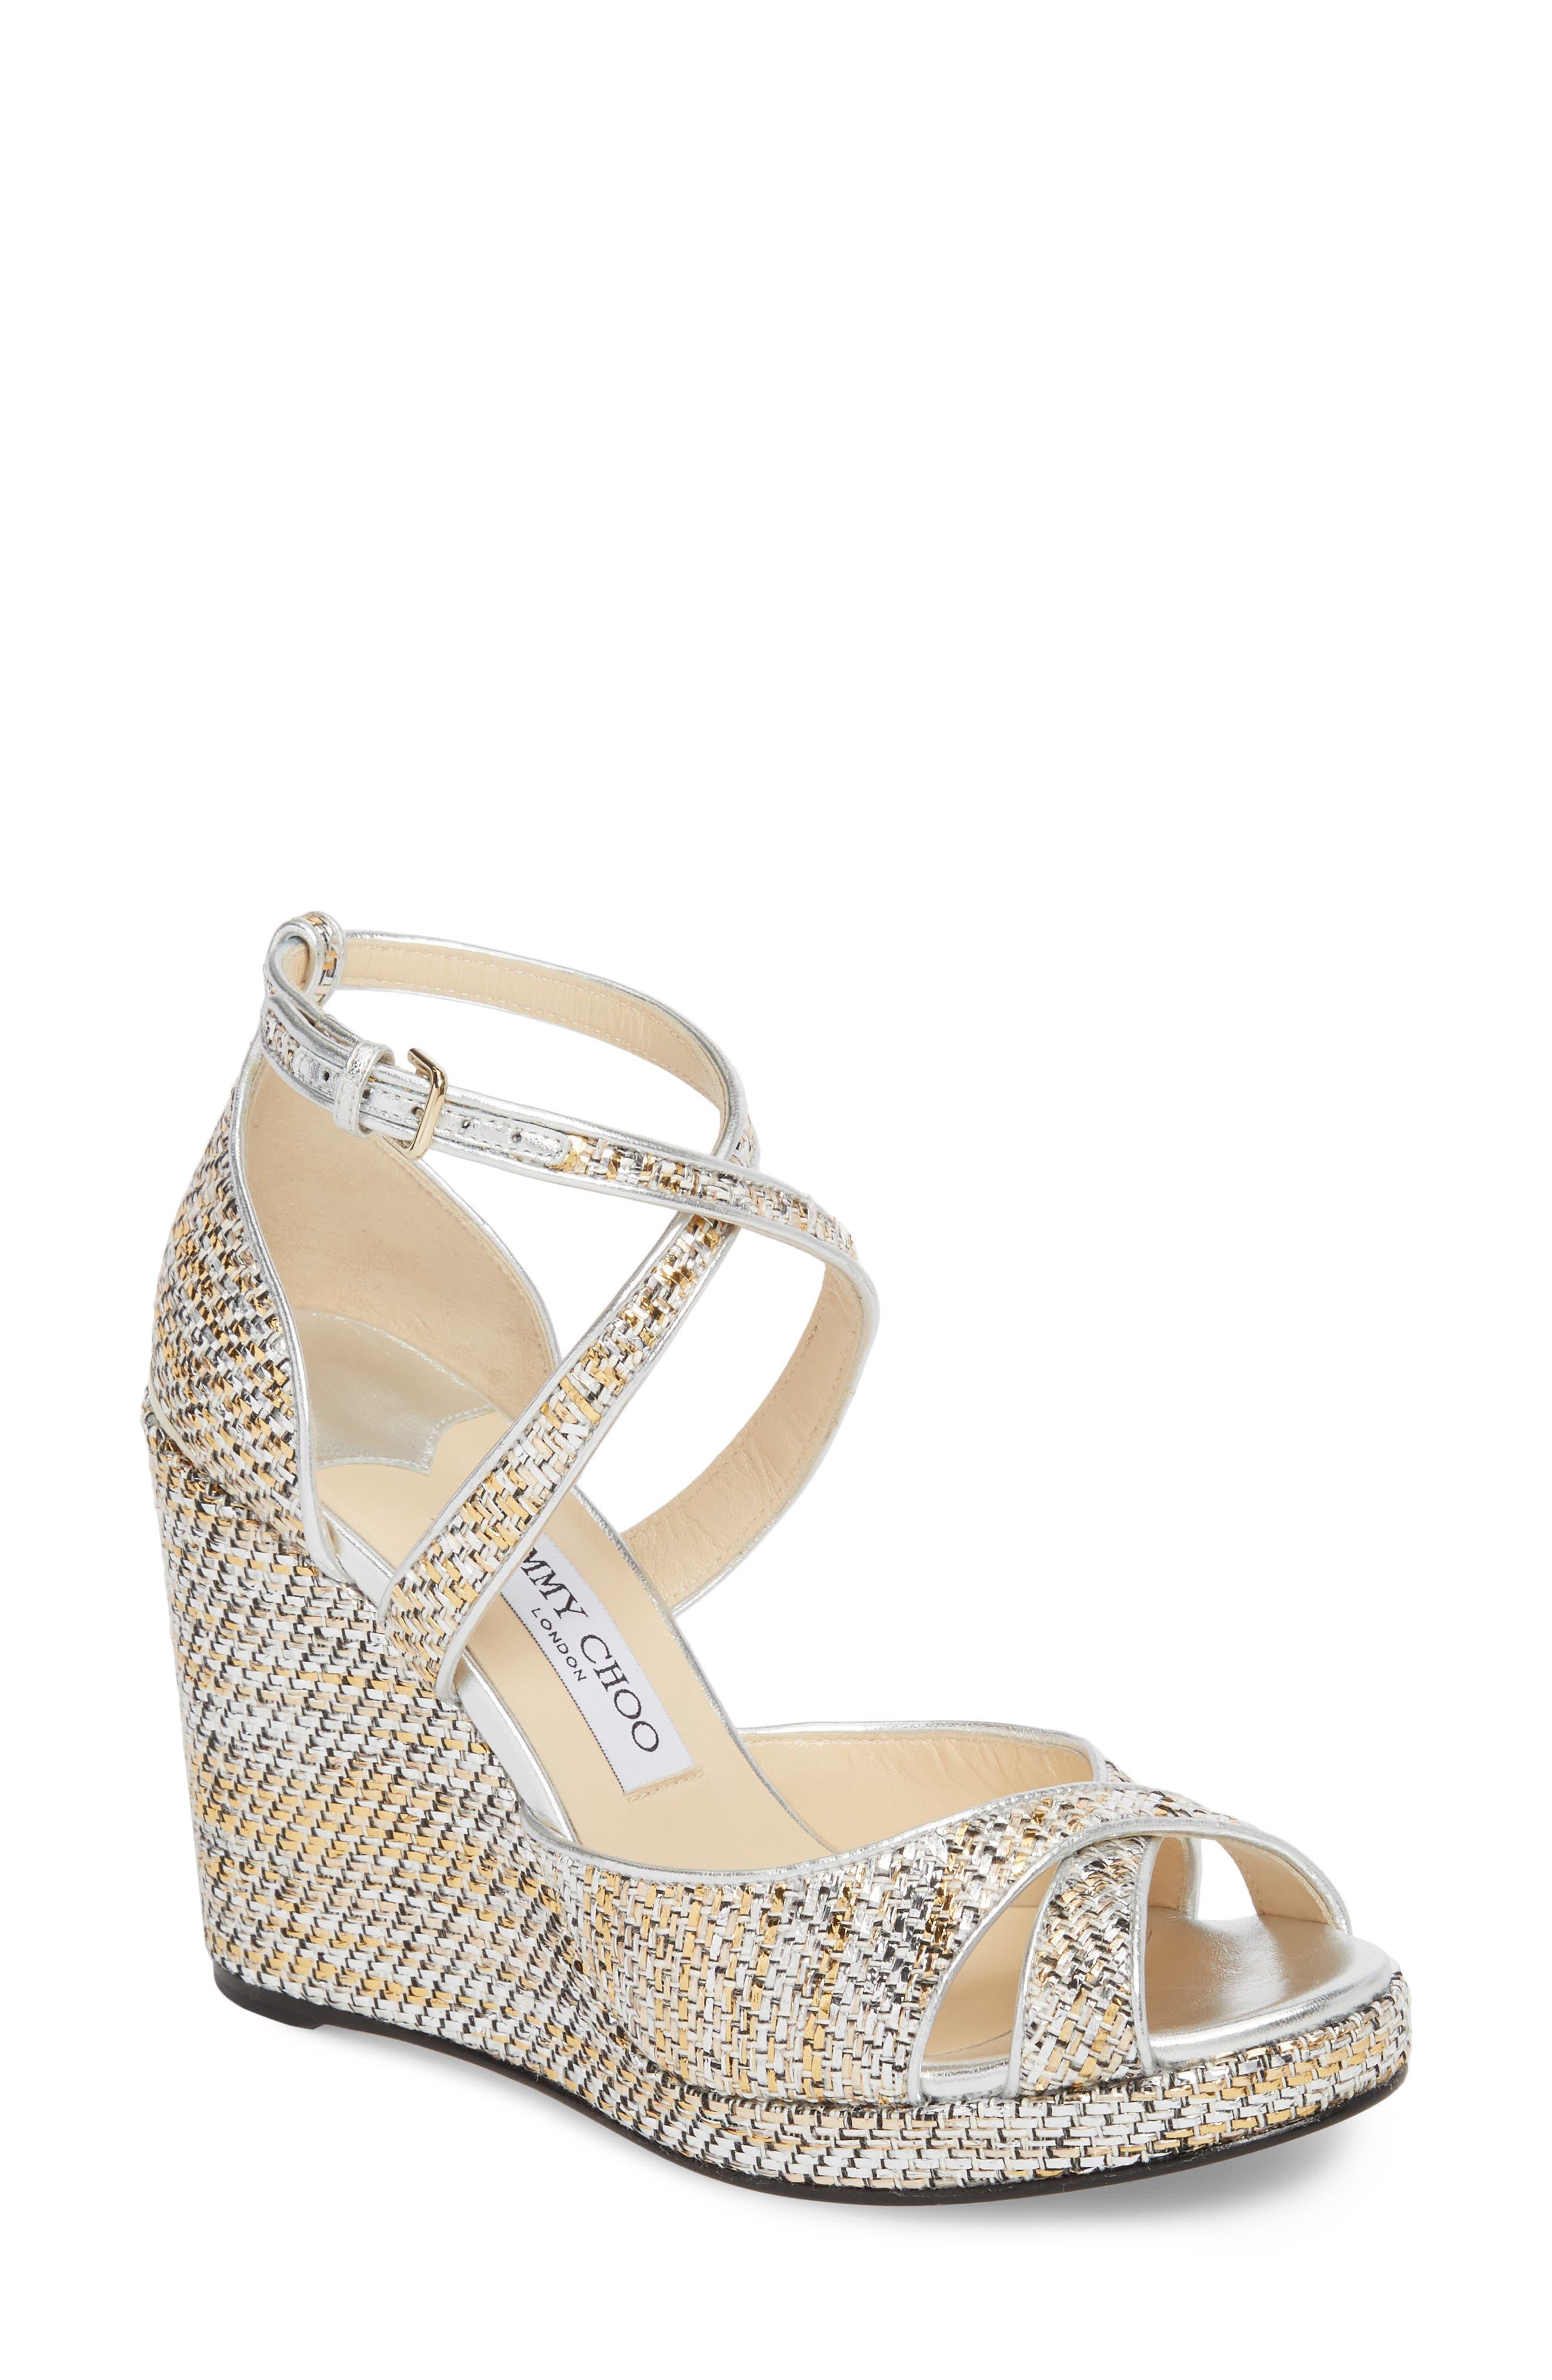 Alanah Metallic Wedge Sandal,                         Main,                         color, SILVER MIX